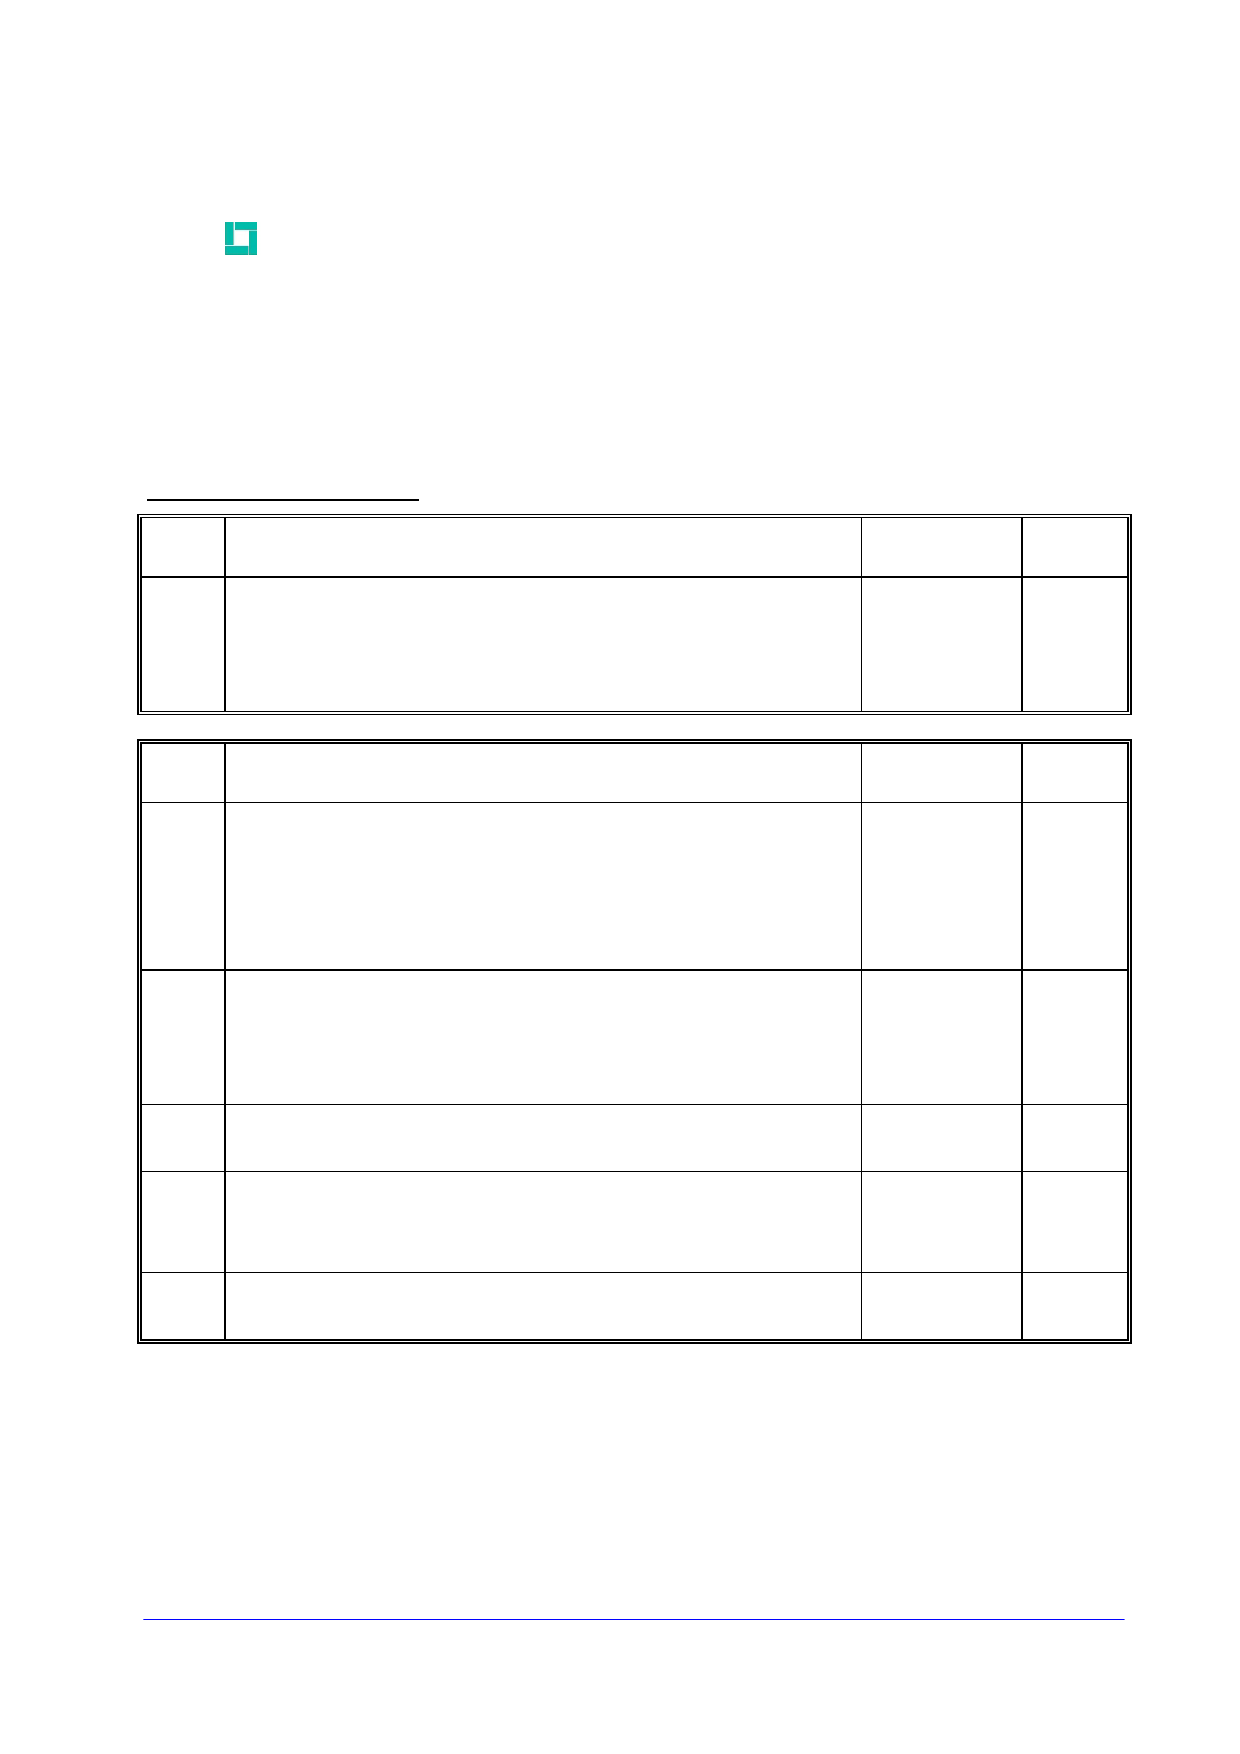 K0769NC600 datasheet